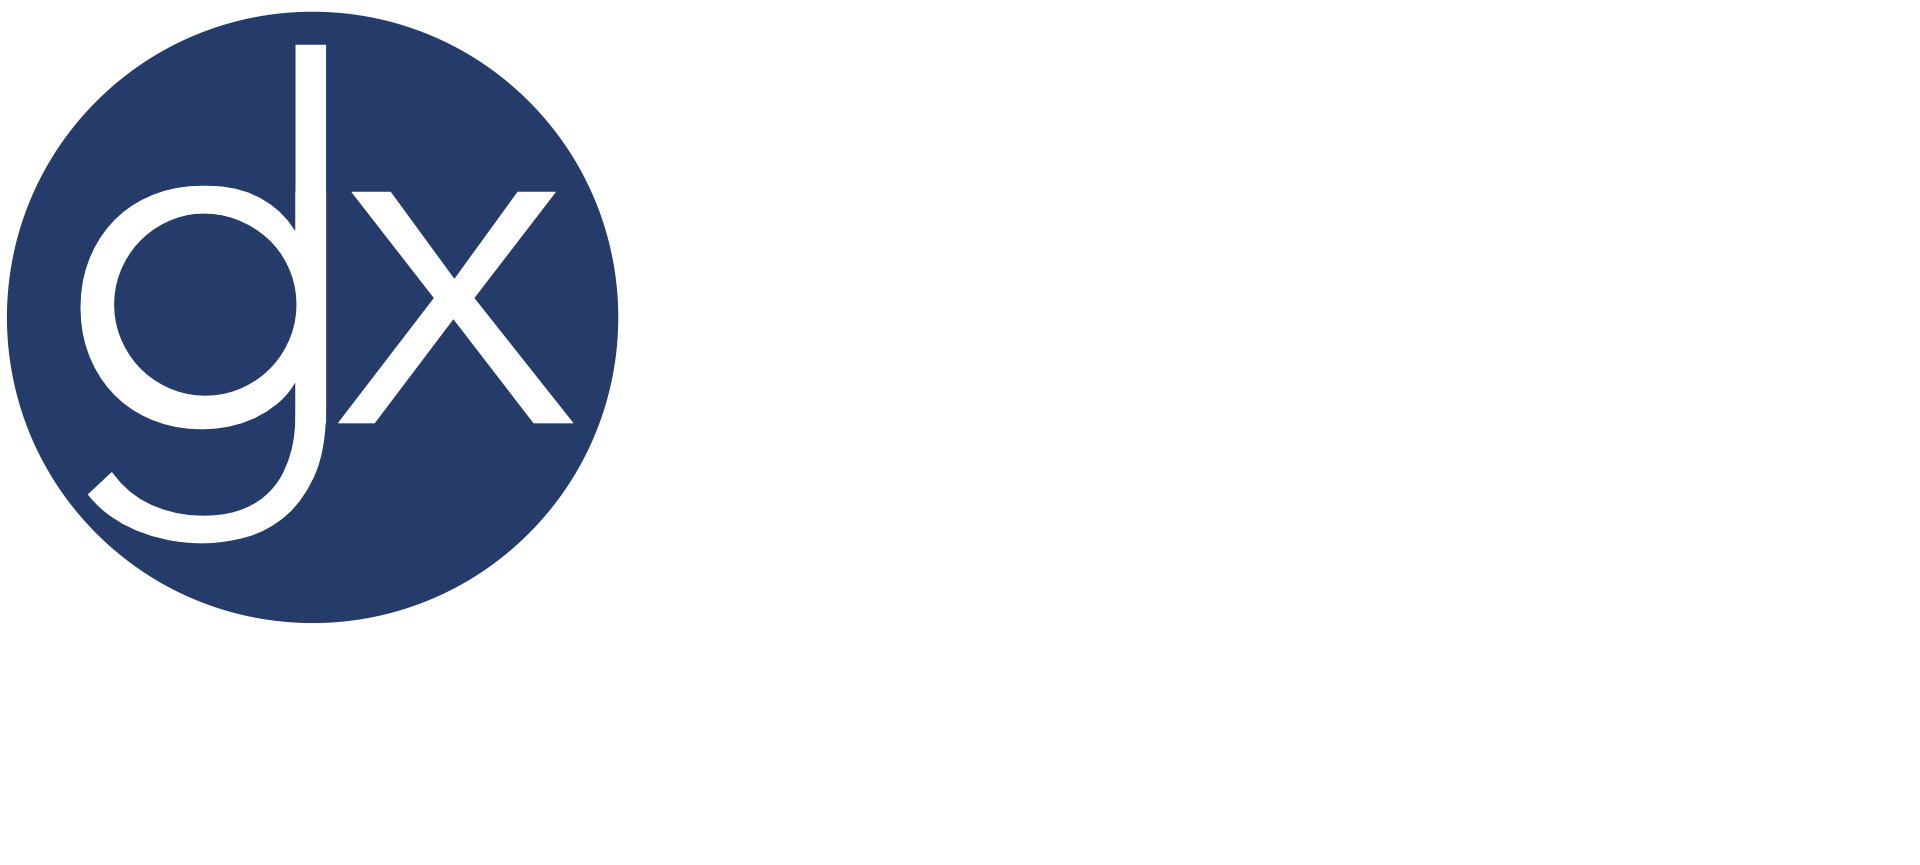 DGX International Travel